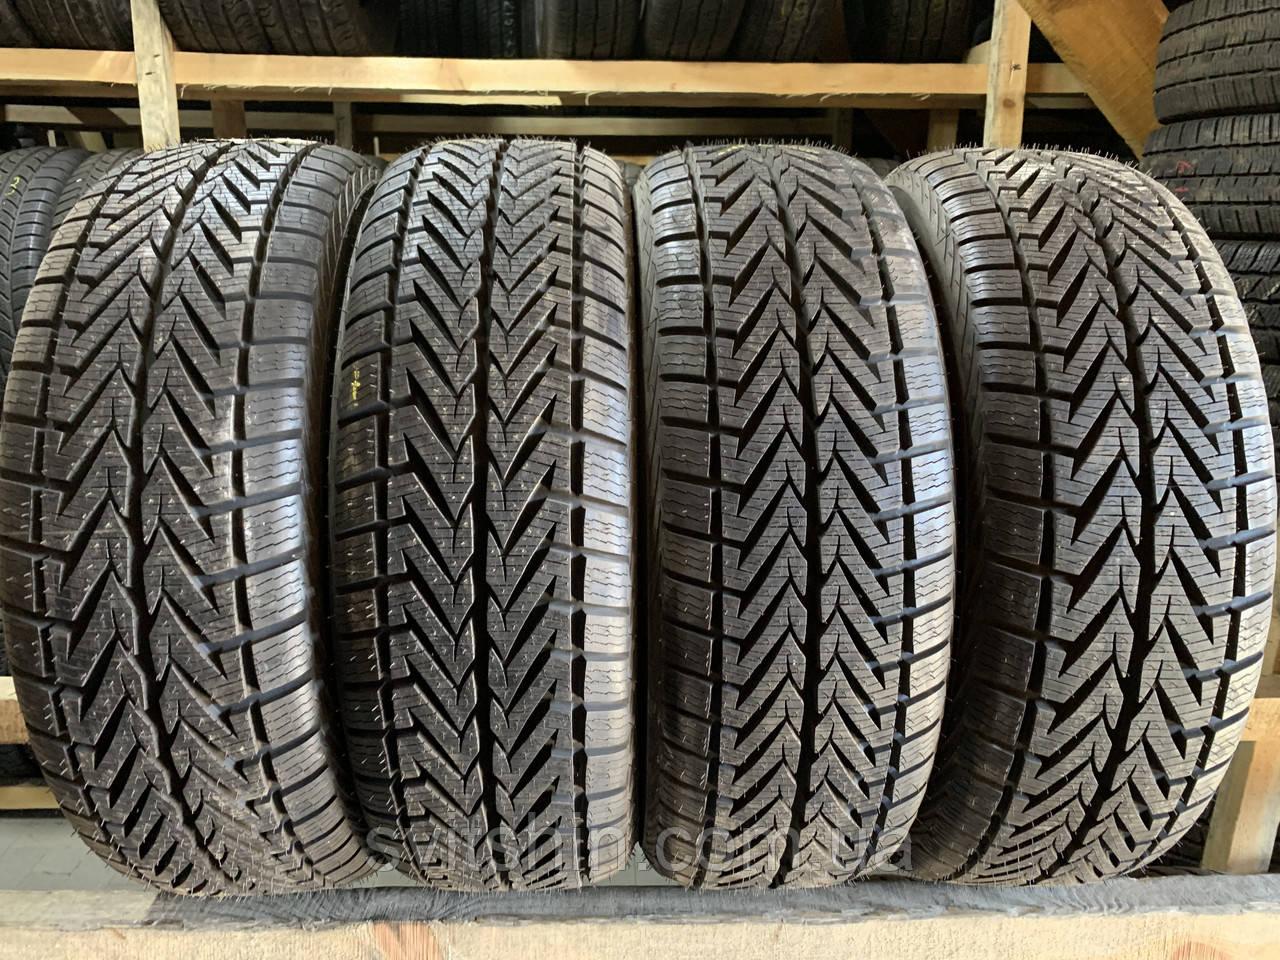 Нові зимові шини 215/65R15 96H VREDESTEIN Wintrac Xtreme R15 215 65